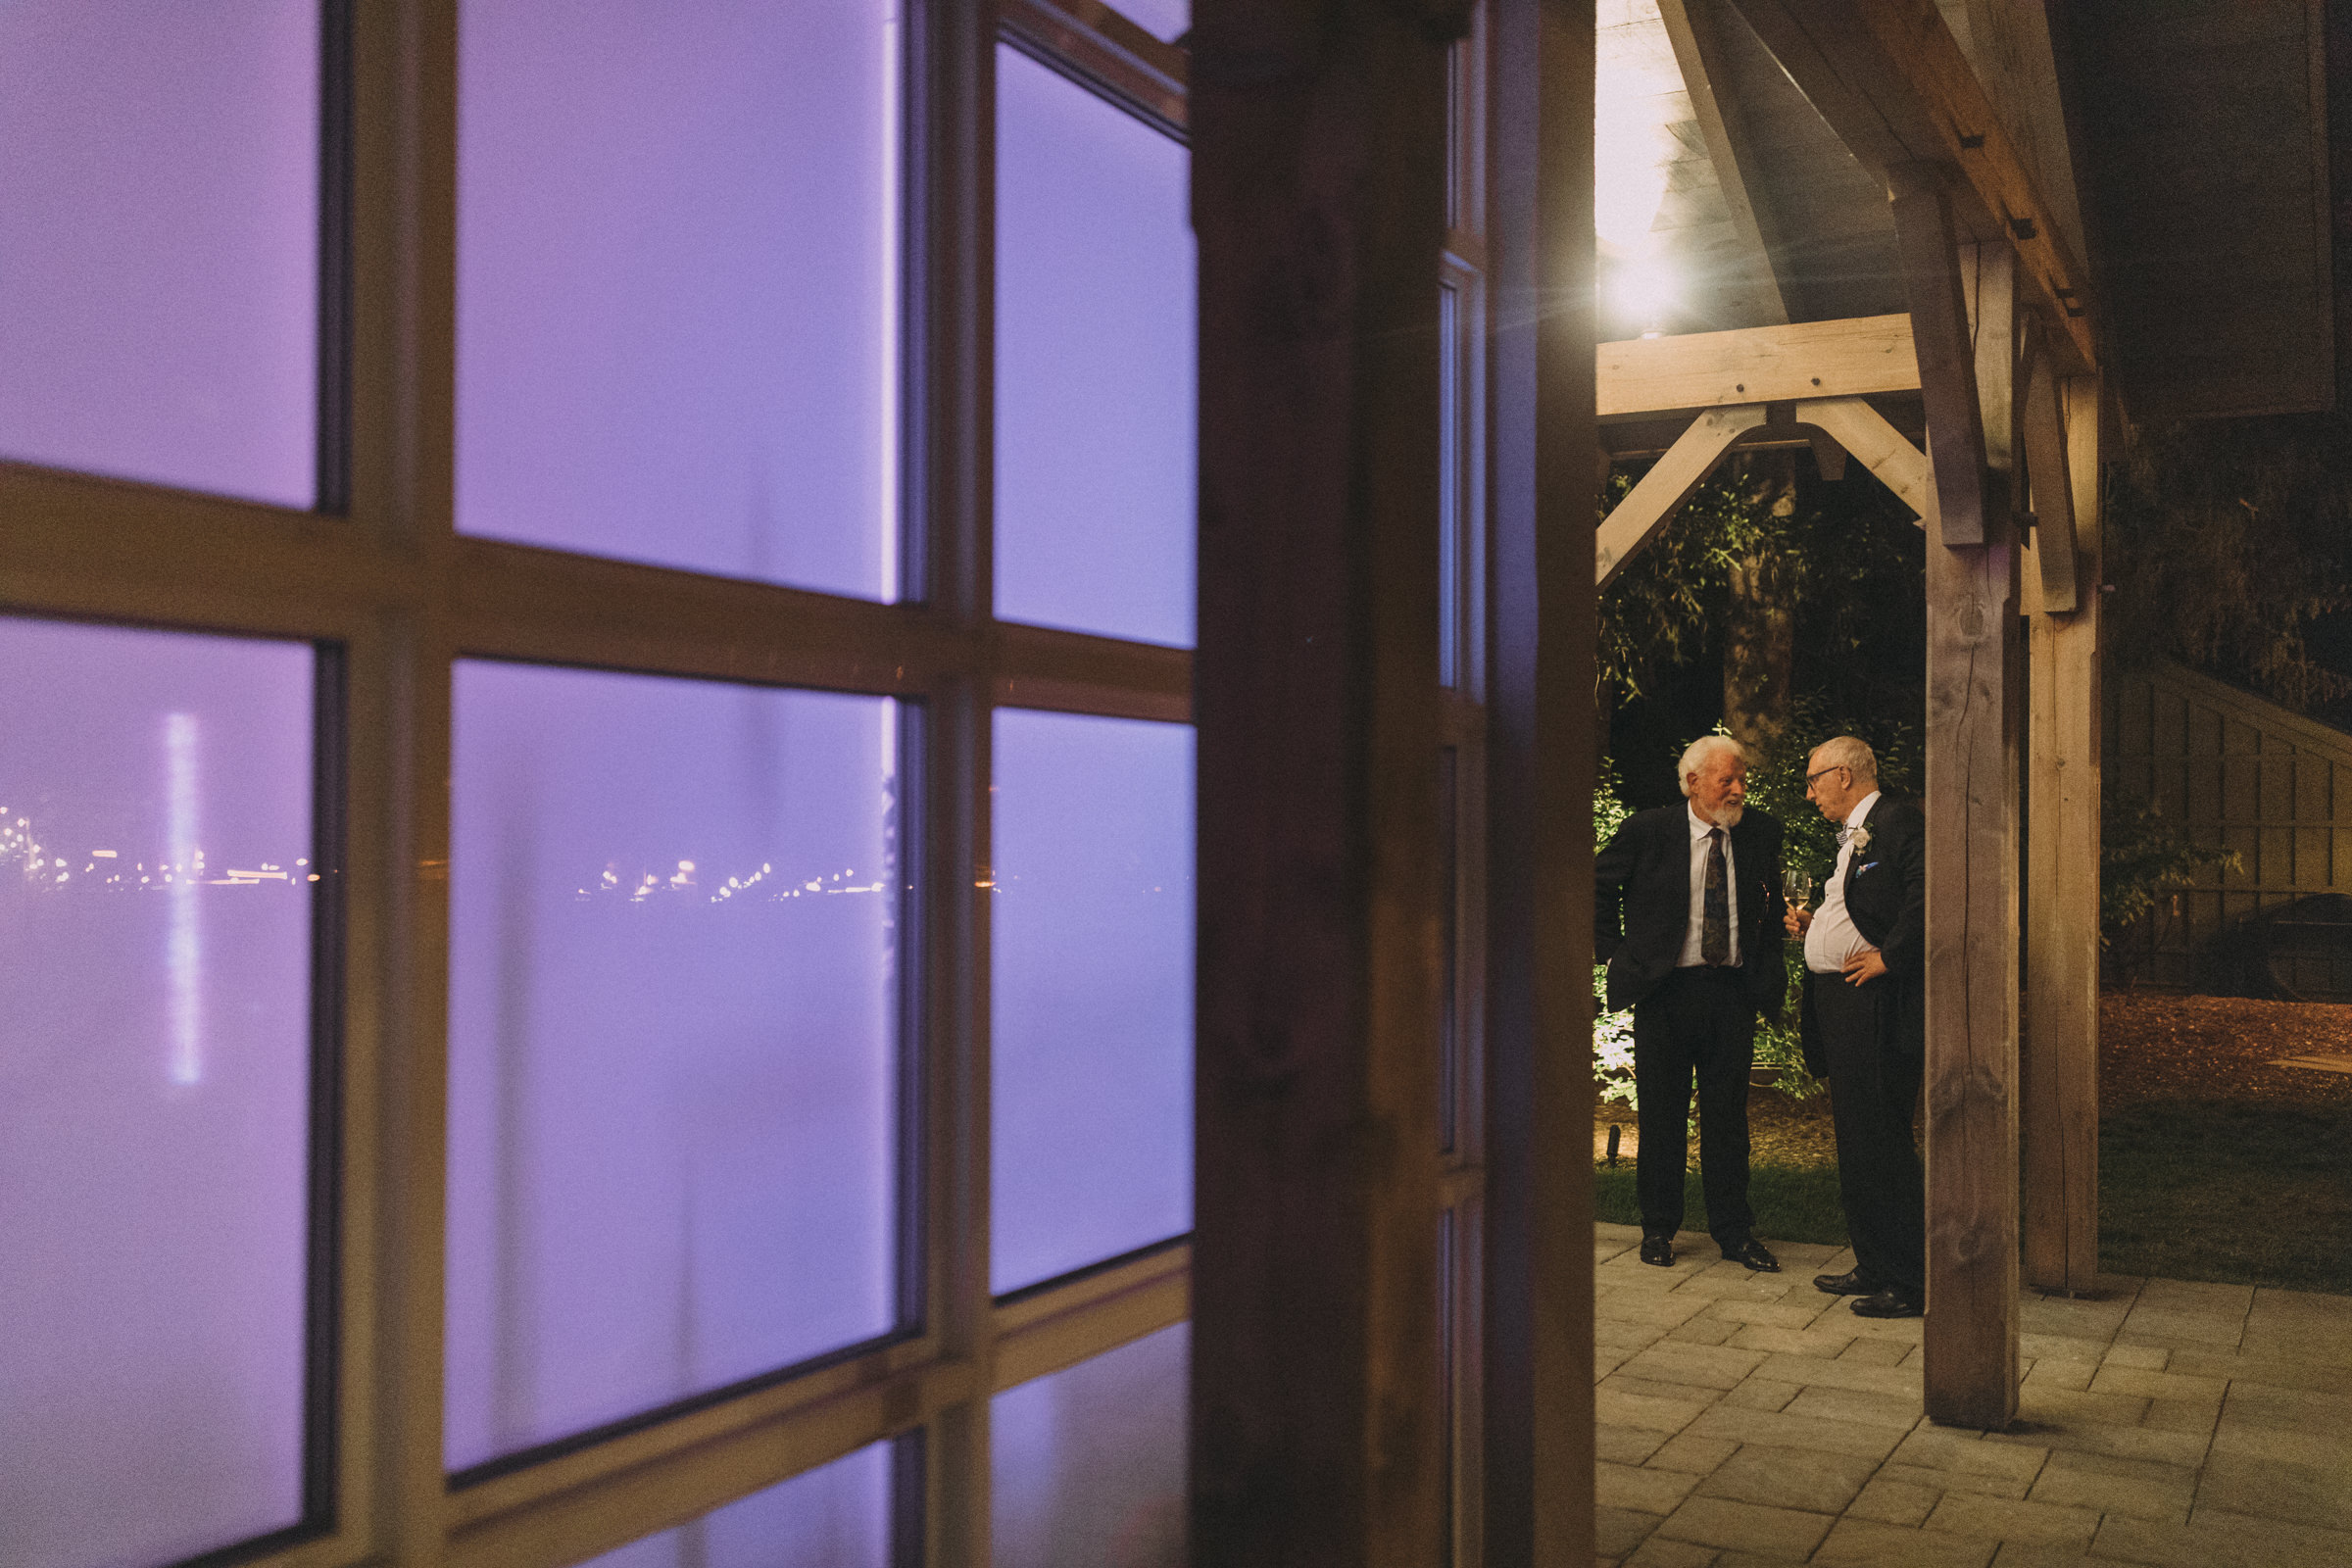 Langdon-Hall-wedding-photography-Cambridge-by-Sam-Wong-of-Visual-Cravings_Sarah-Ryan_61.jpg